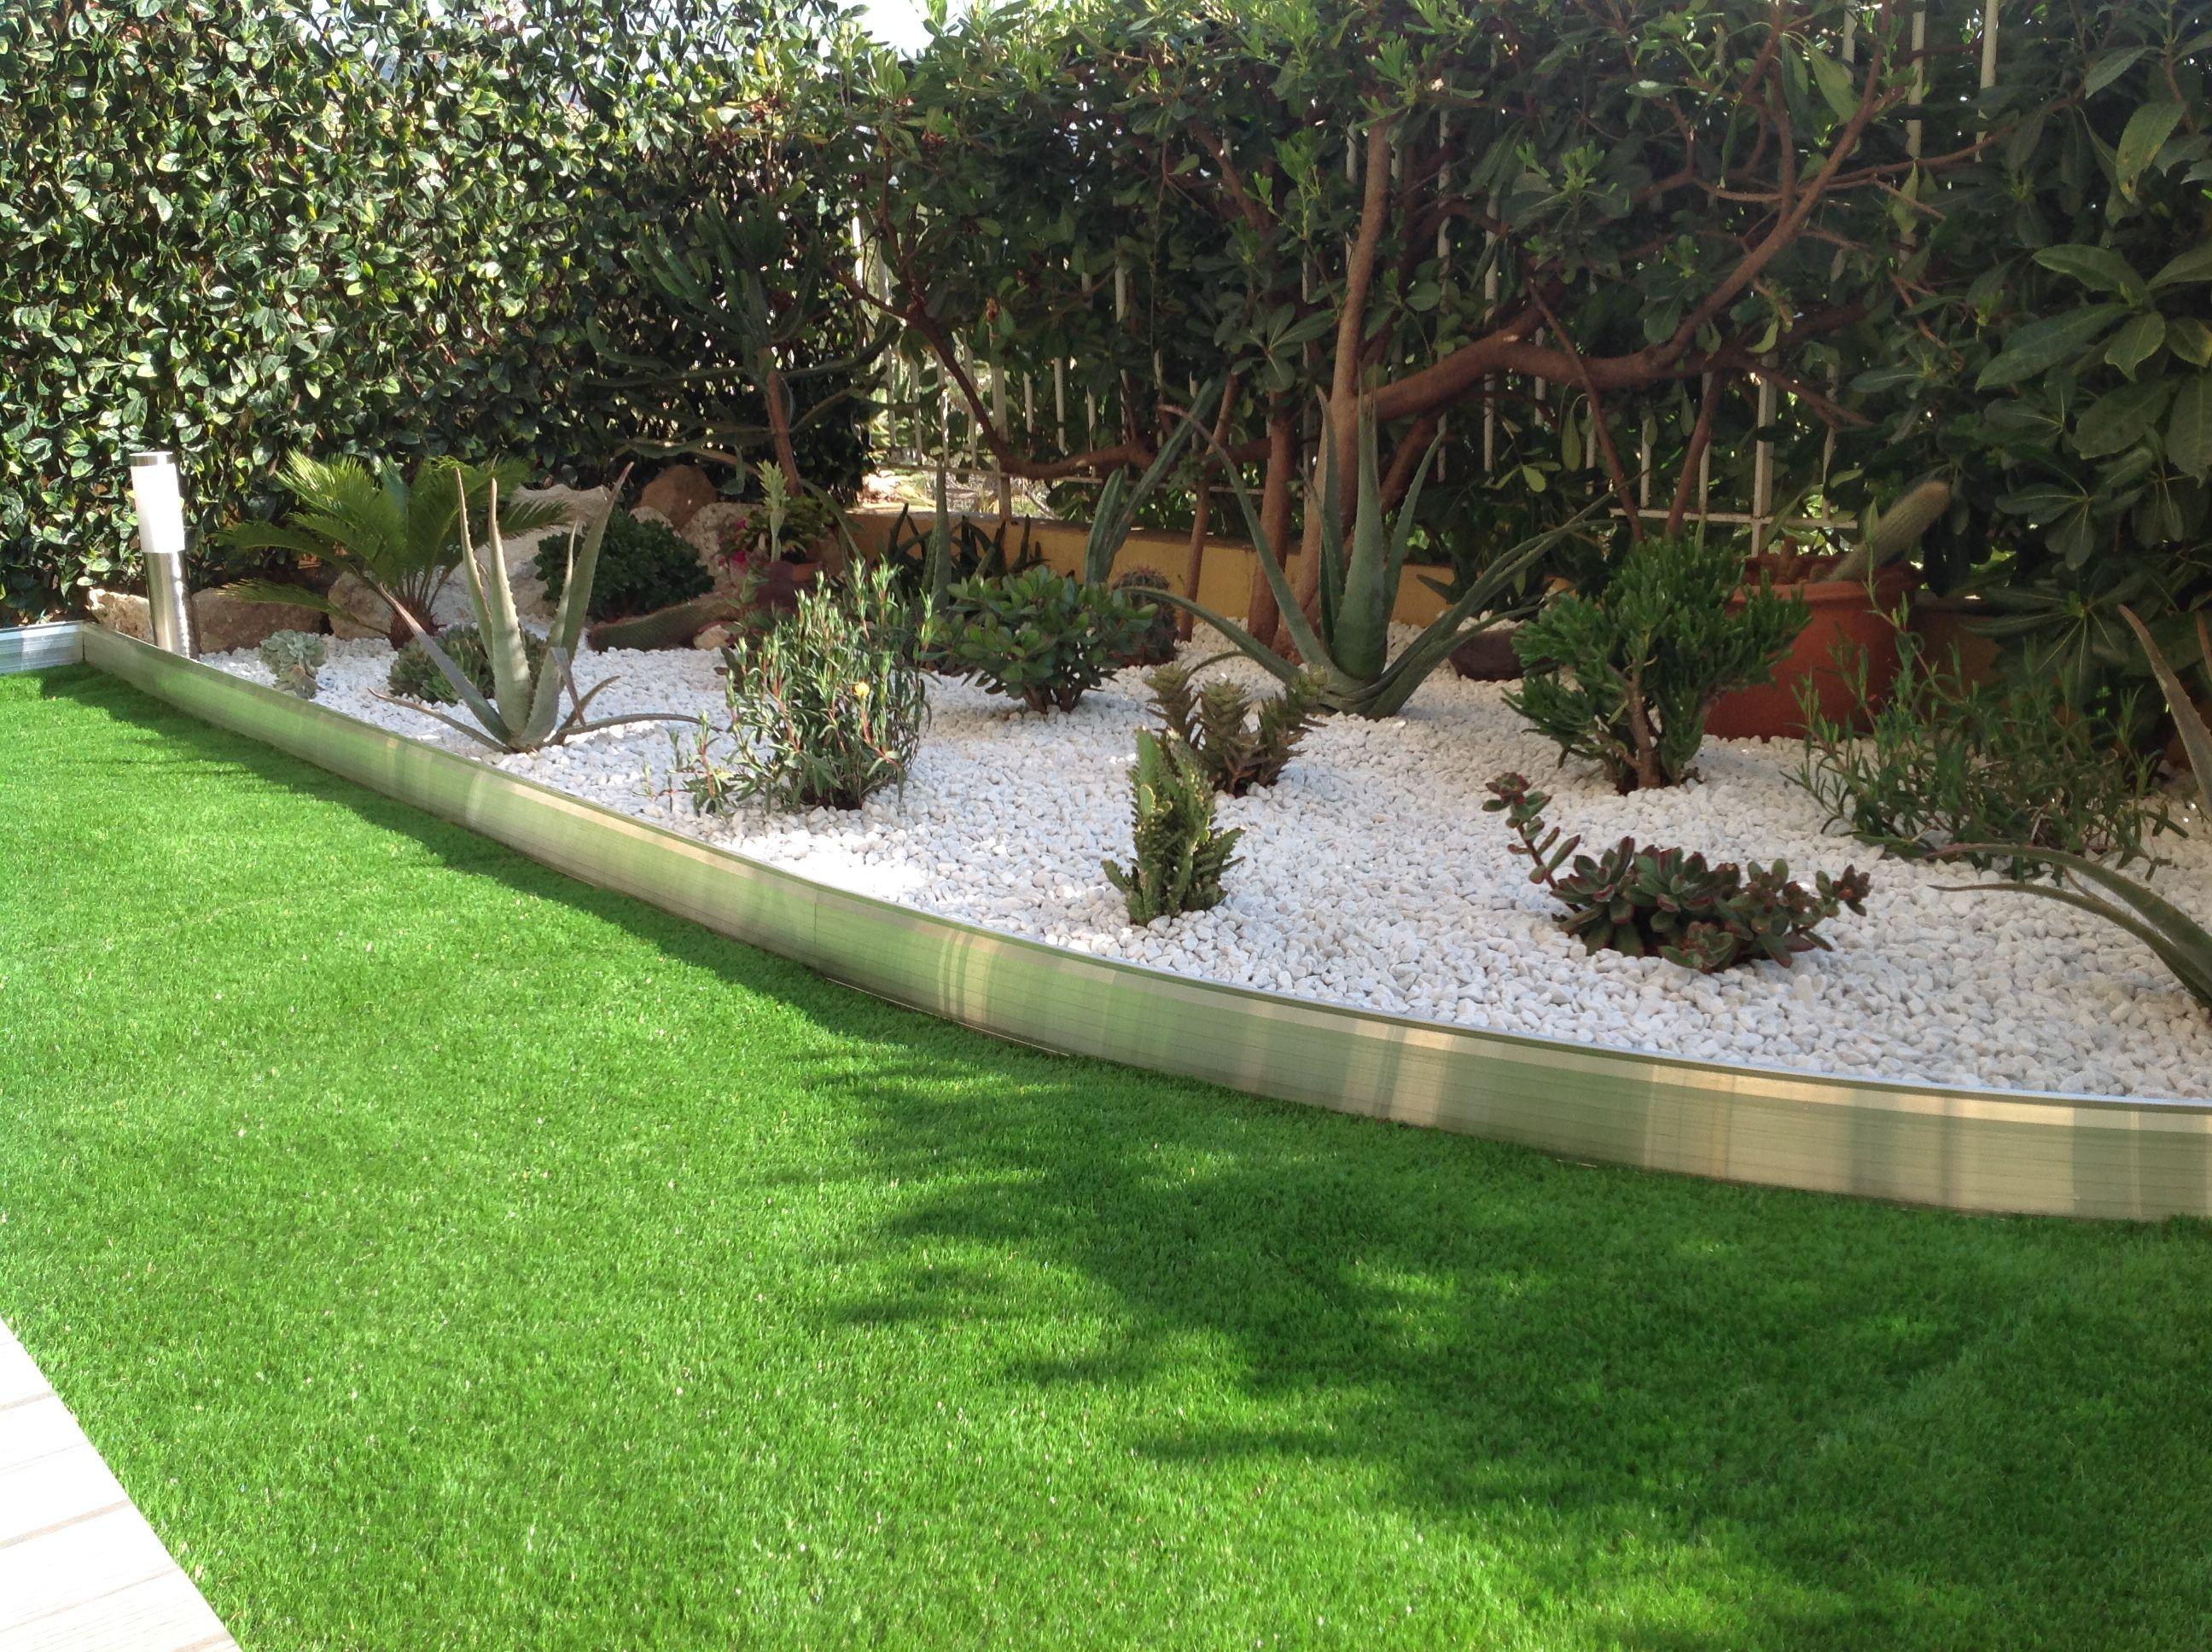 bordure de jardin en aluminium brut avec clairage led tanche int gr finition aluminium brut. Black Bedroom Furniture Sets. Home Design Ideas